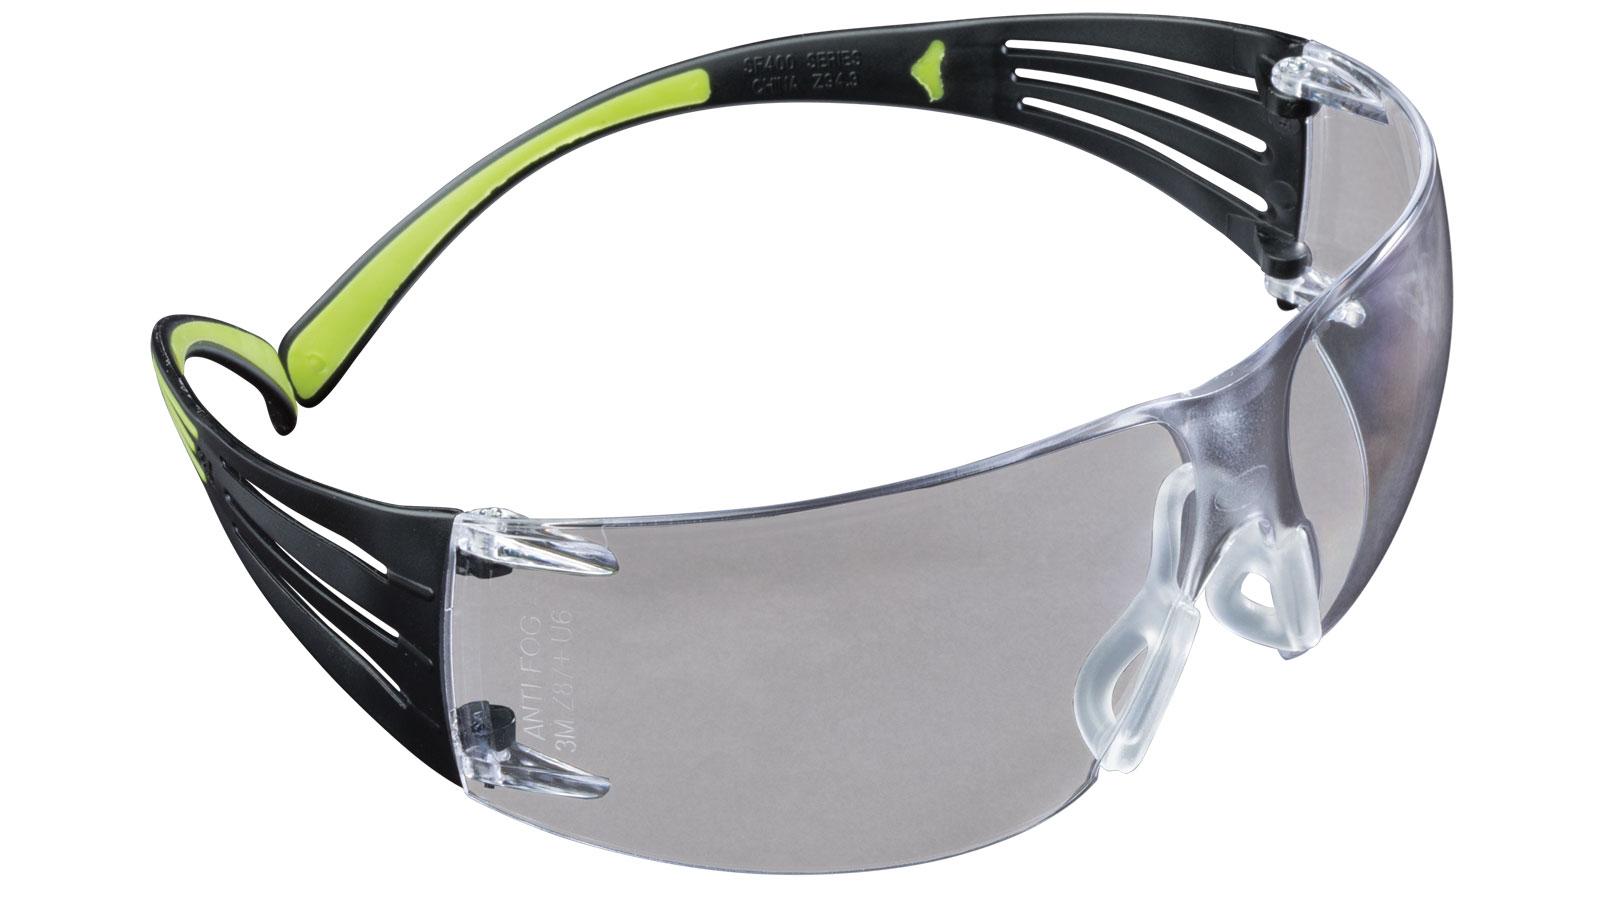 3M Peltor SF400PC8  Sport SecureFit 400 Shooting|Sporting Glasses Black|Green Frame Clear Polycarbonate Lens 1 Pair